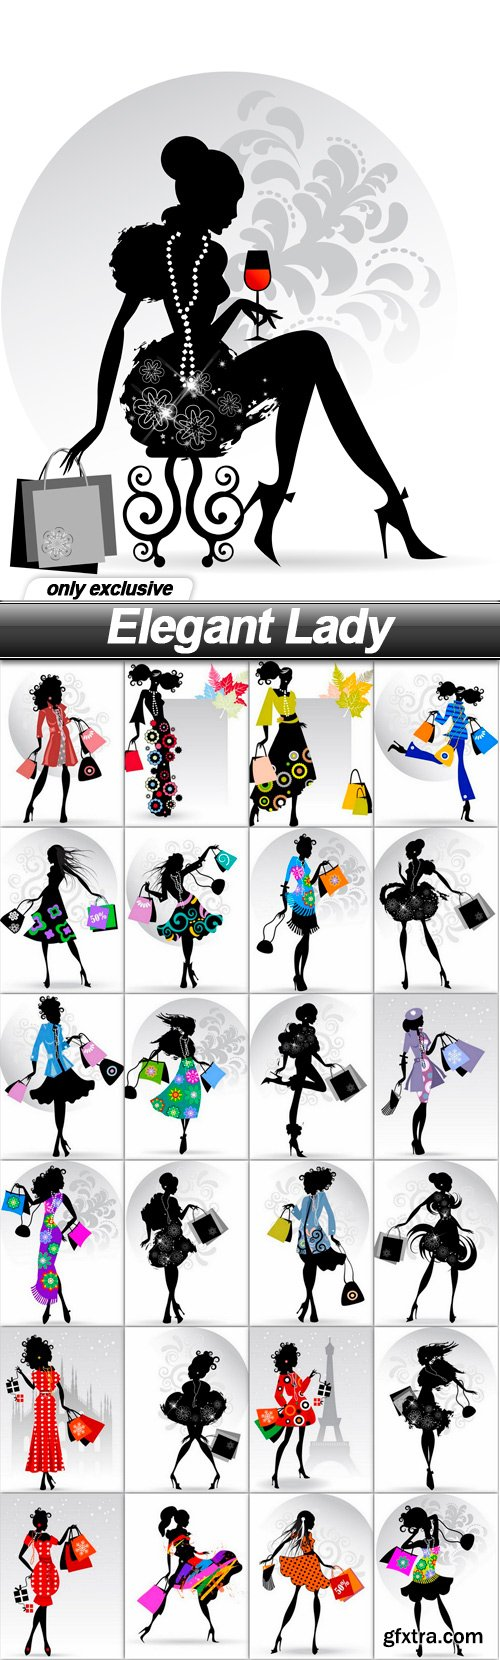 Elegant Lady - 25 EPS